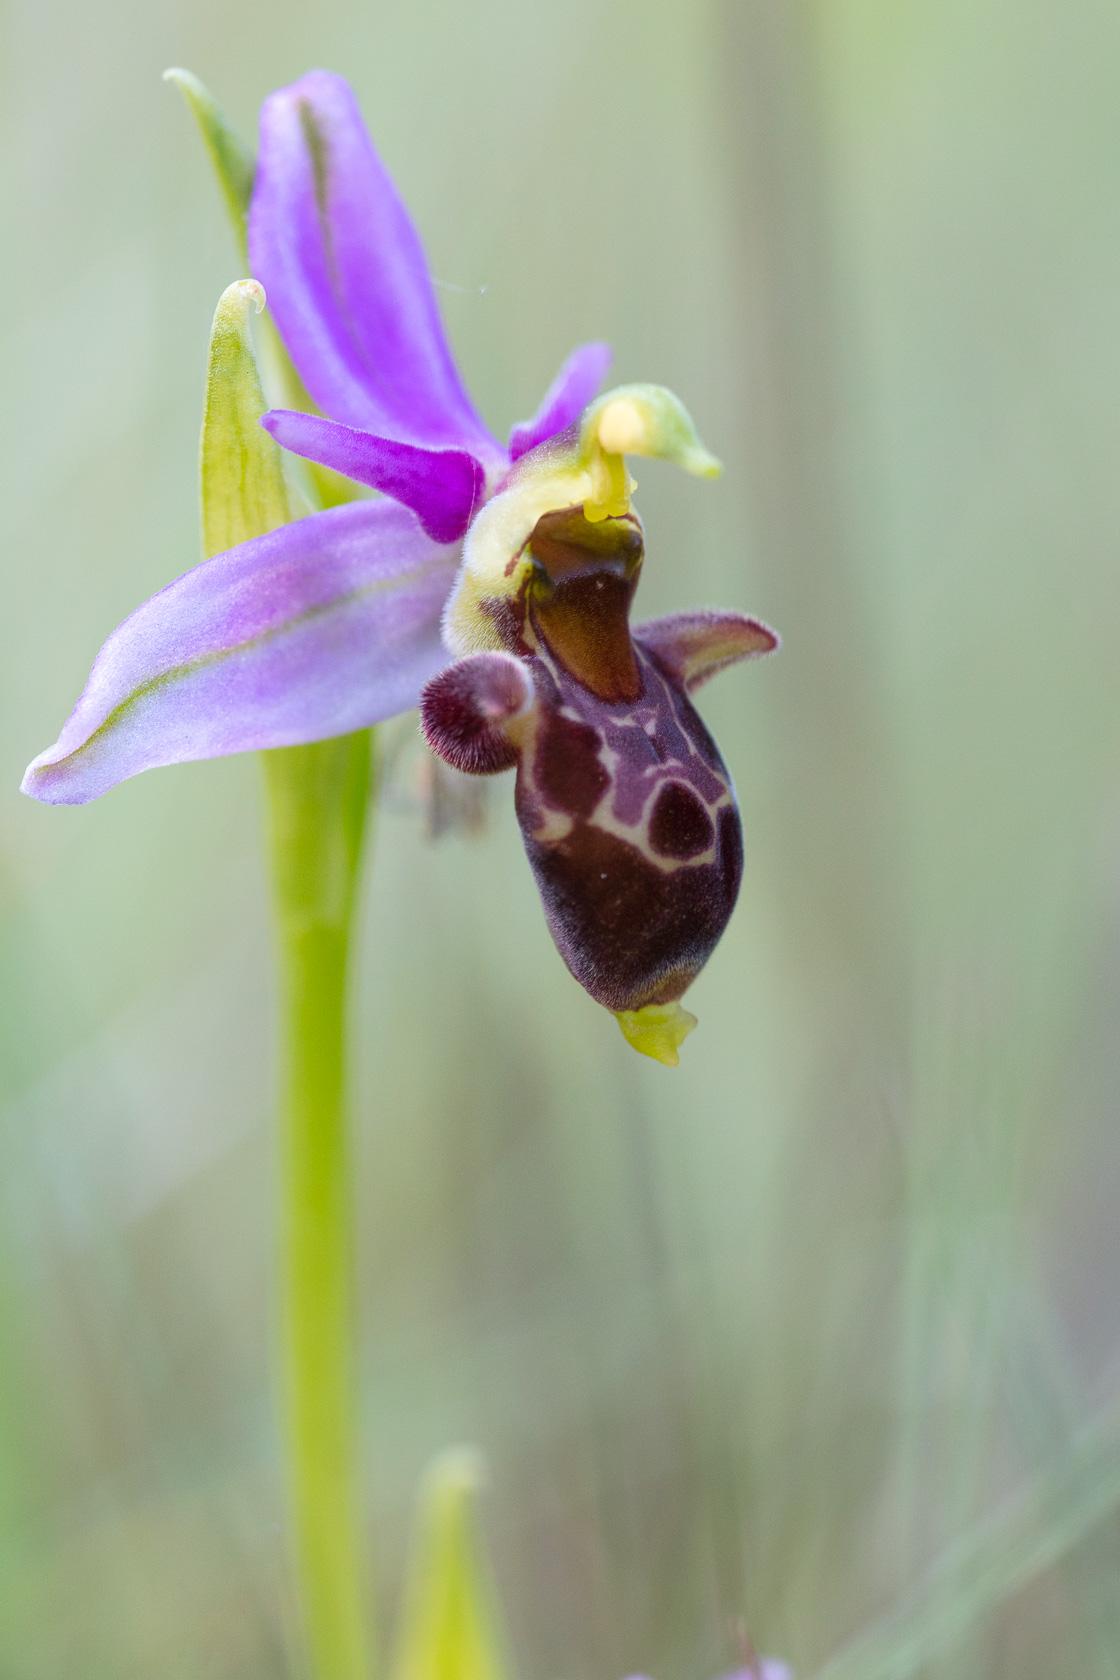 orchidée Ophrys bécasse (Ophrys scolopax) en Dordogne